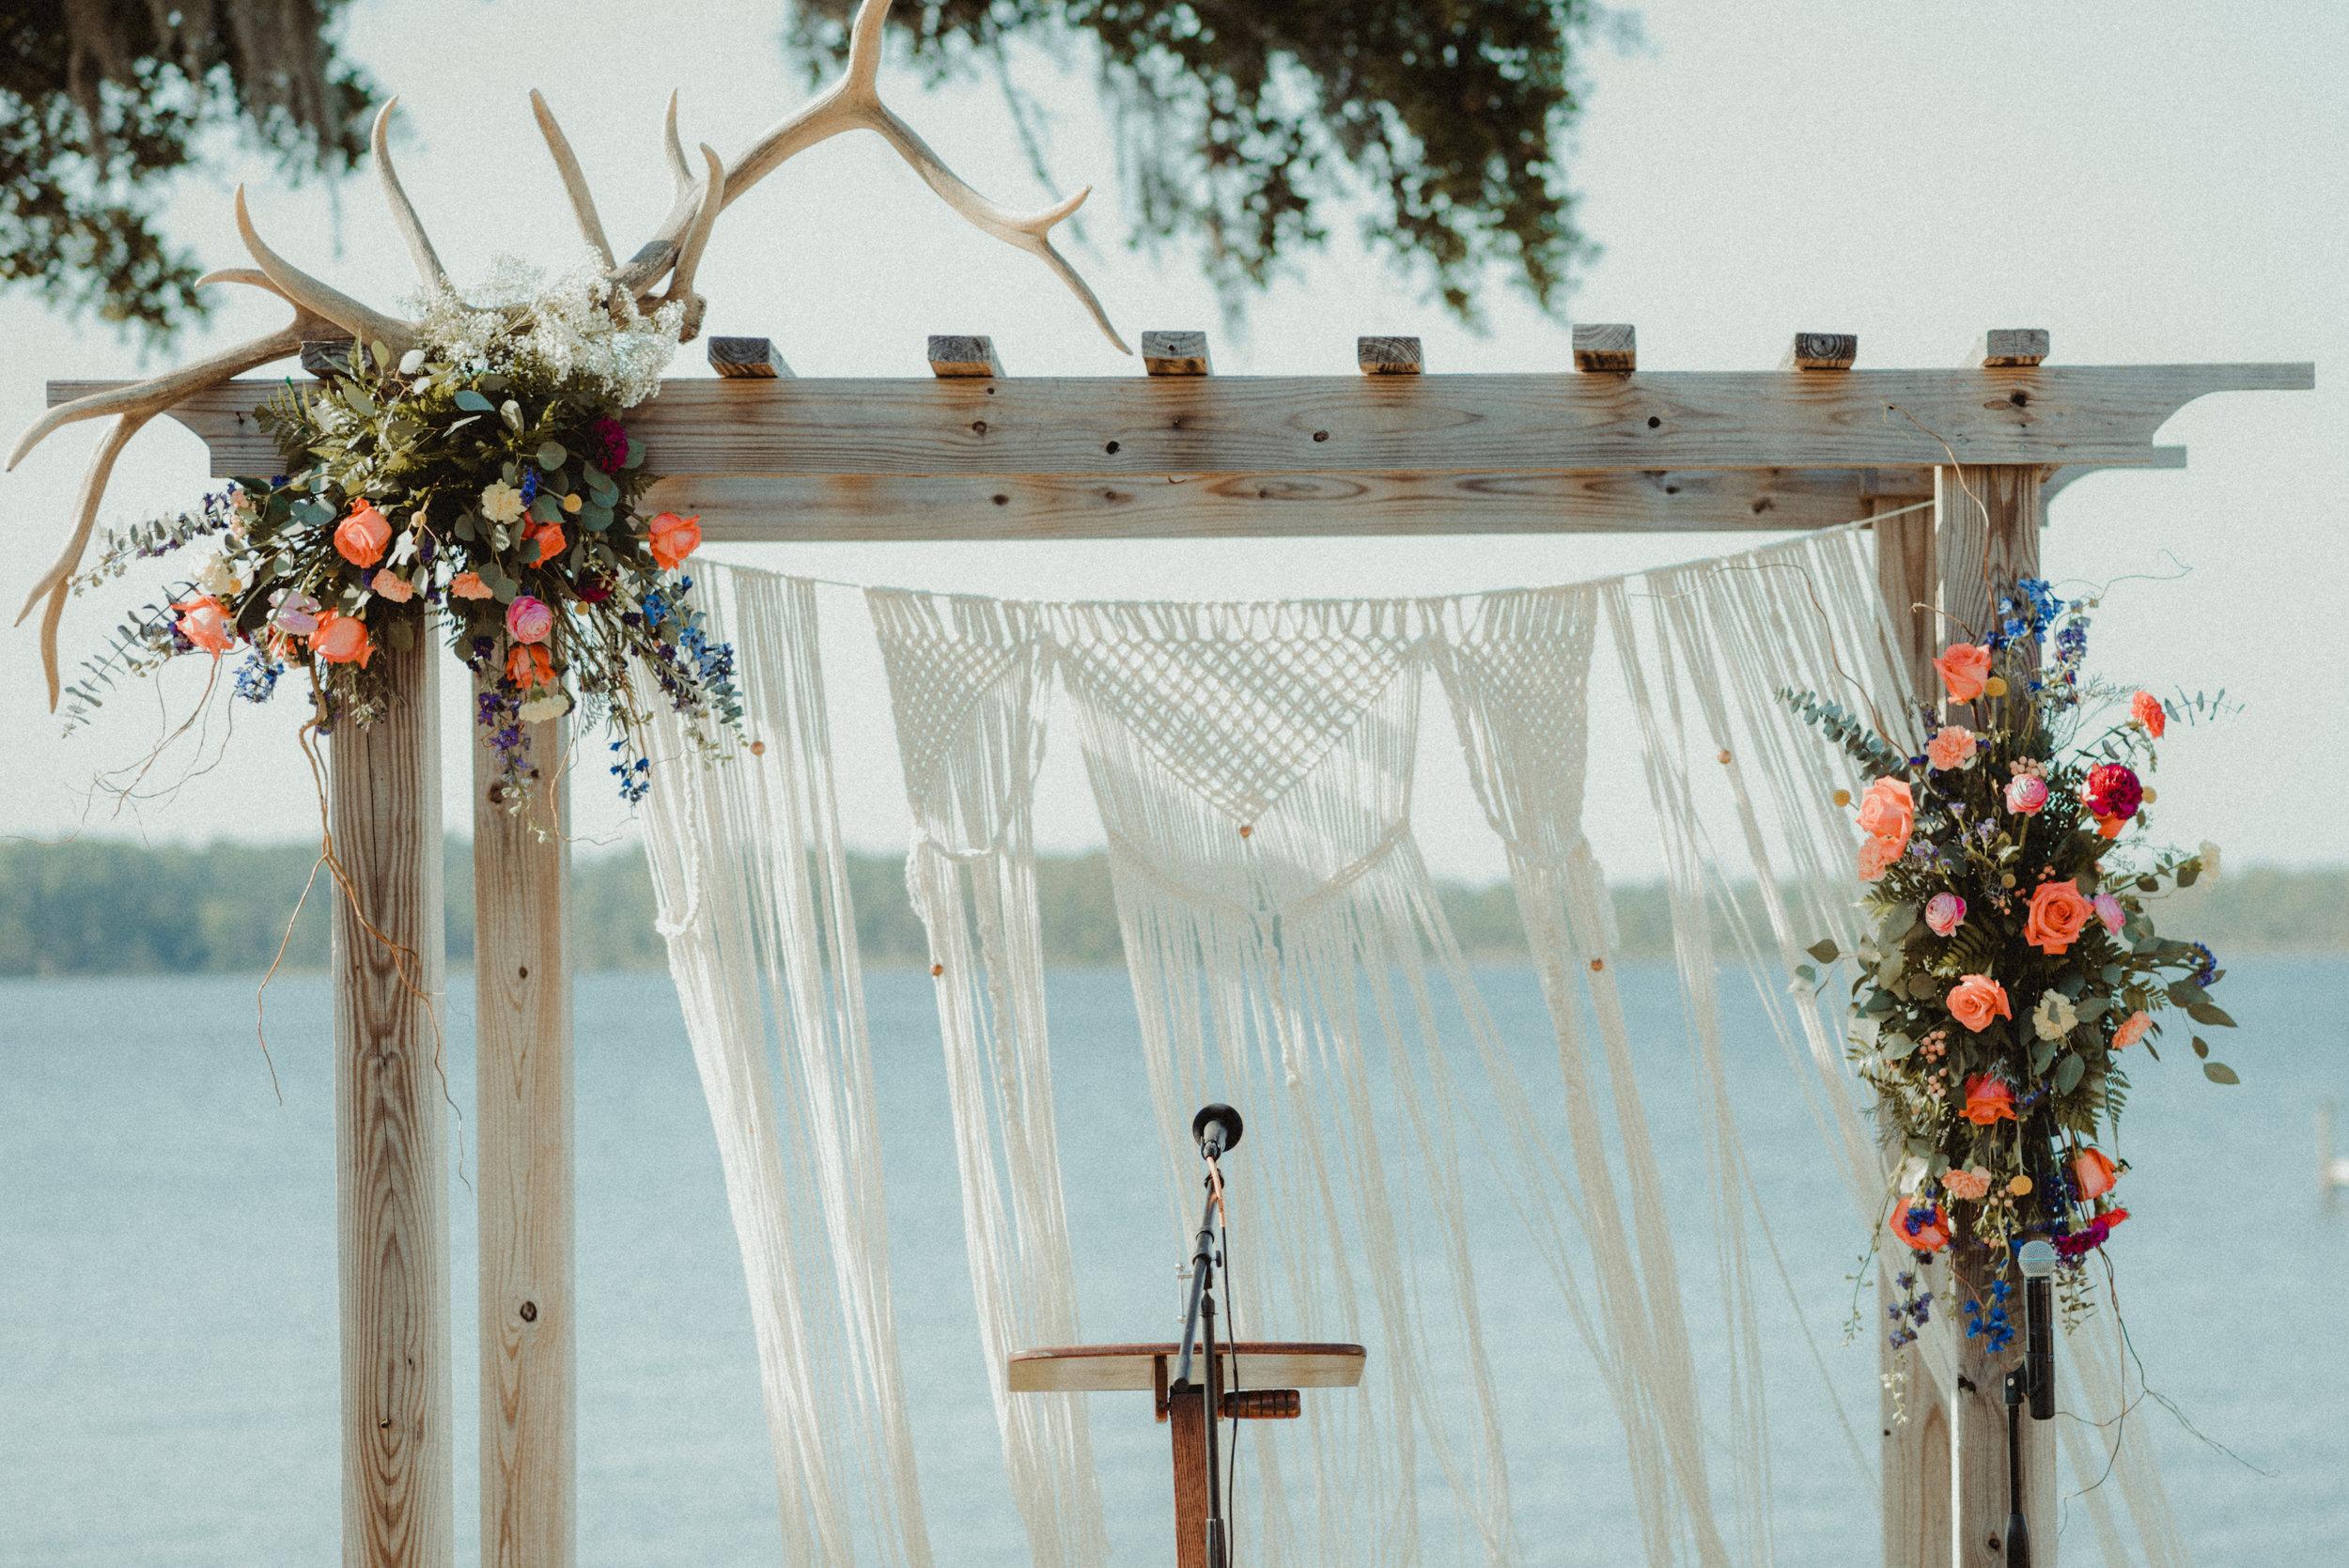 zayda-collin-panama-city-wedding-photography-trippy-bohemian-lisa-frank-wedding-venue-5.jpg